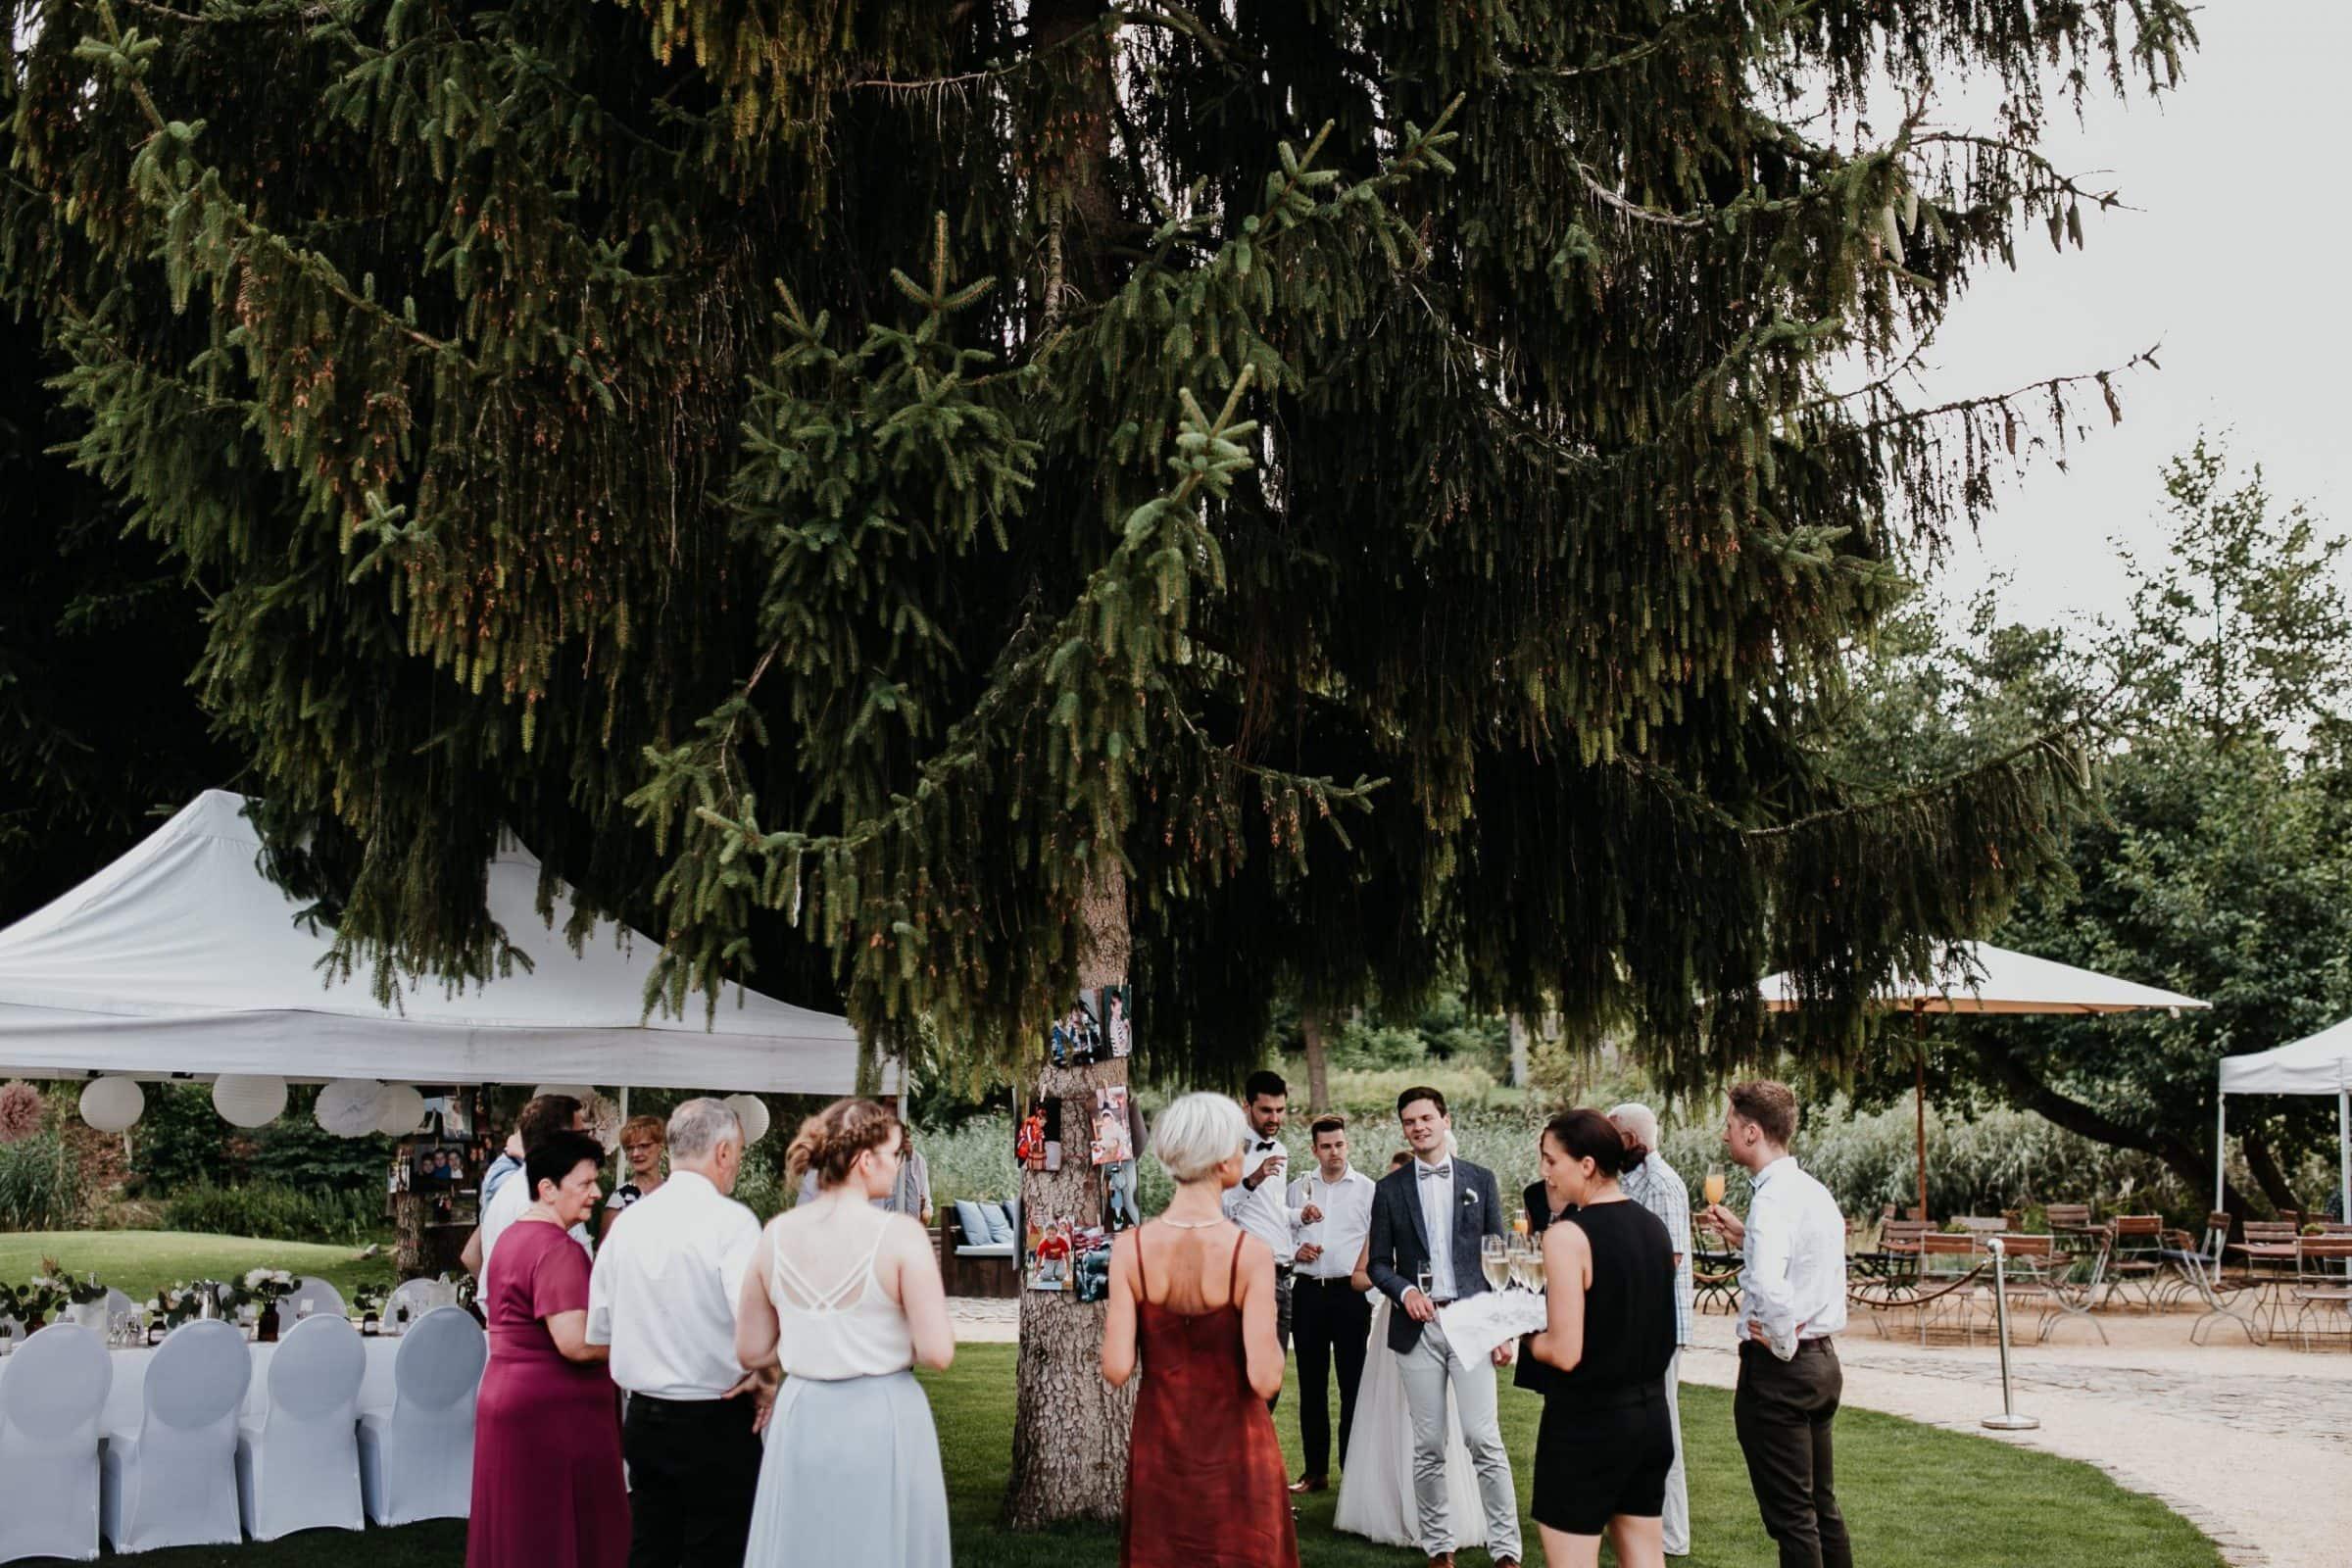 wedding guests, laughter, laughing, table decor, garden wedding, garden tent, hochzeitsgäste, zelt, brautvater, rede, speech